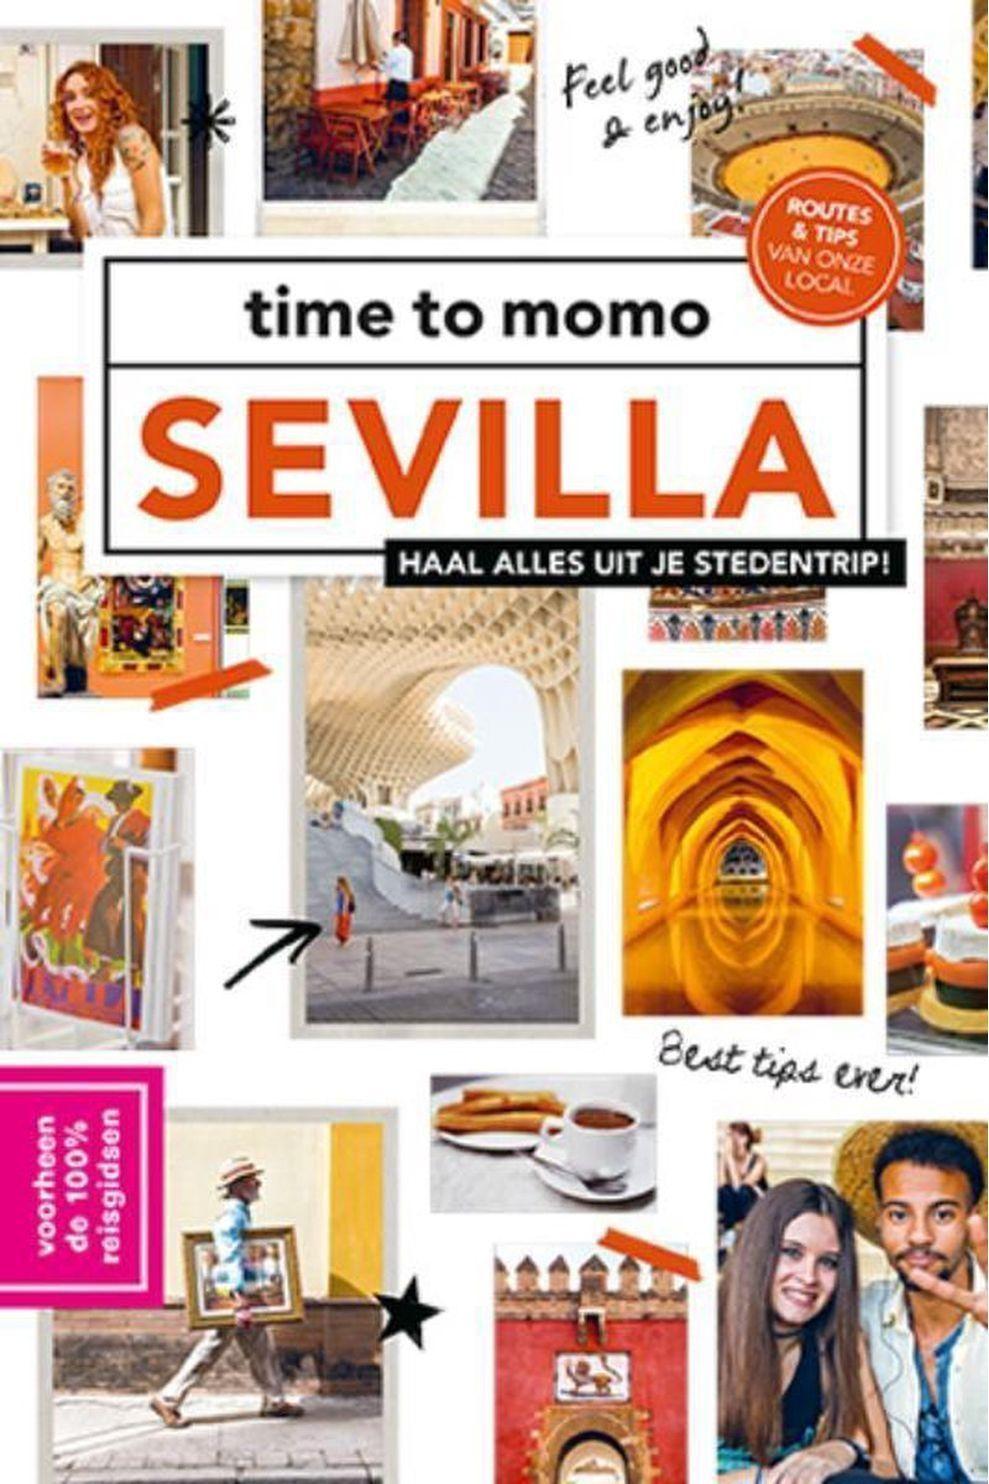 Momedia Sevilla Time To Momo - 2019